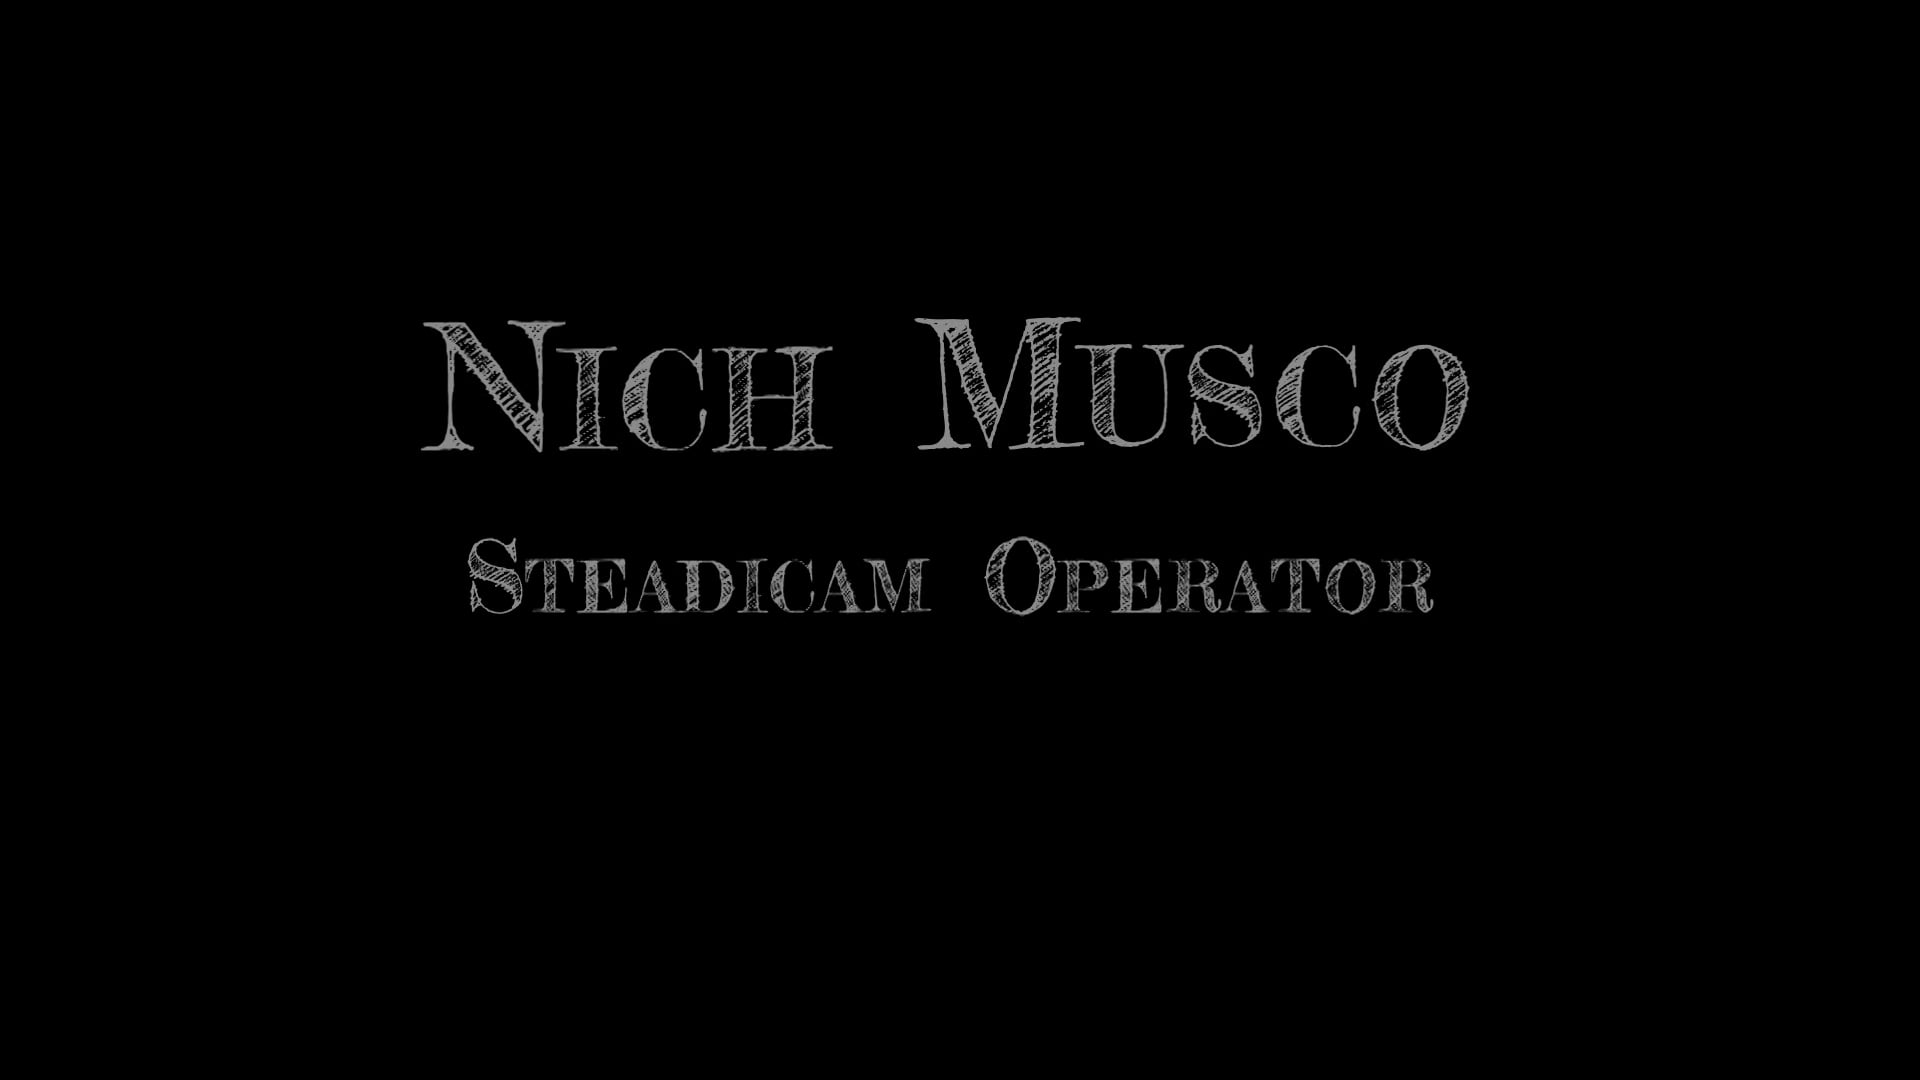 Nich Musco Steadicam Reel